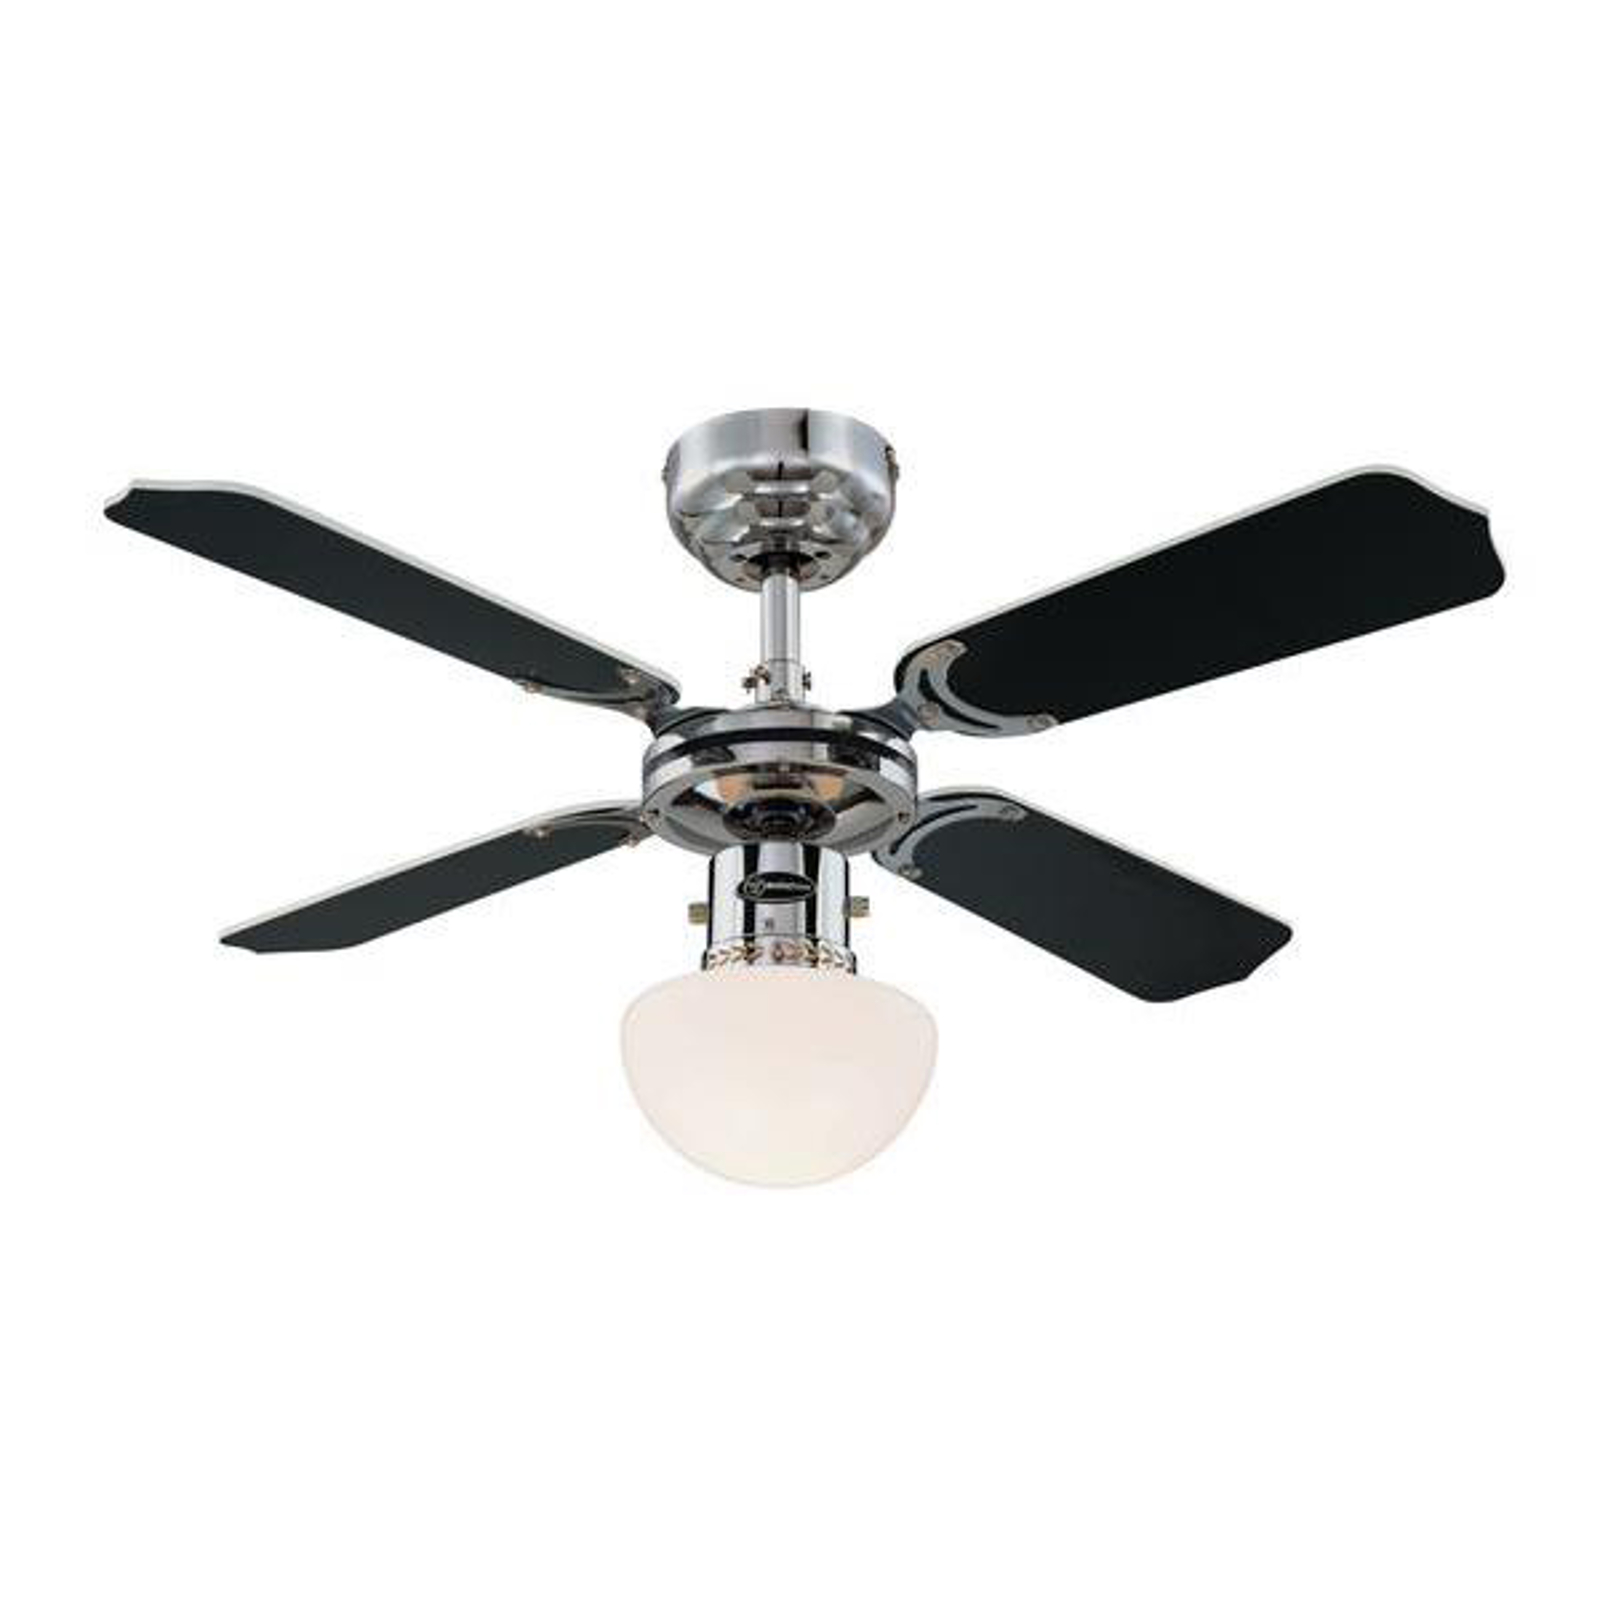 Westinghouse Portland Ambiance Ventilator m. Licht